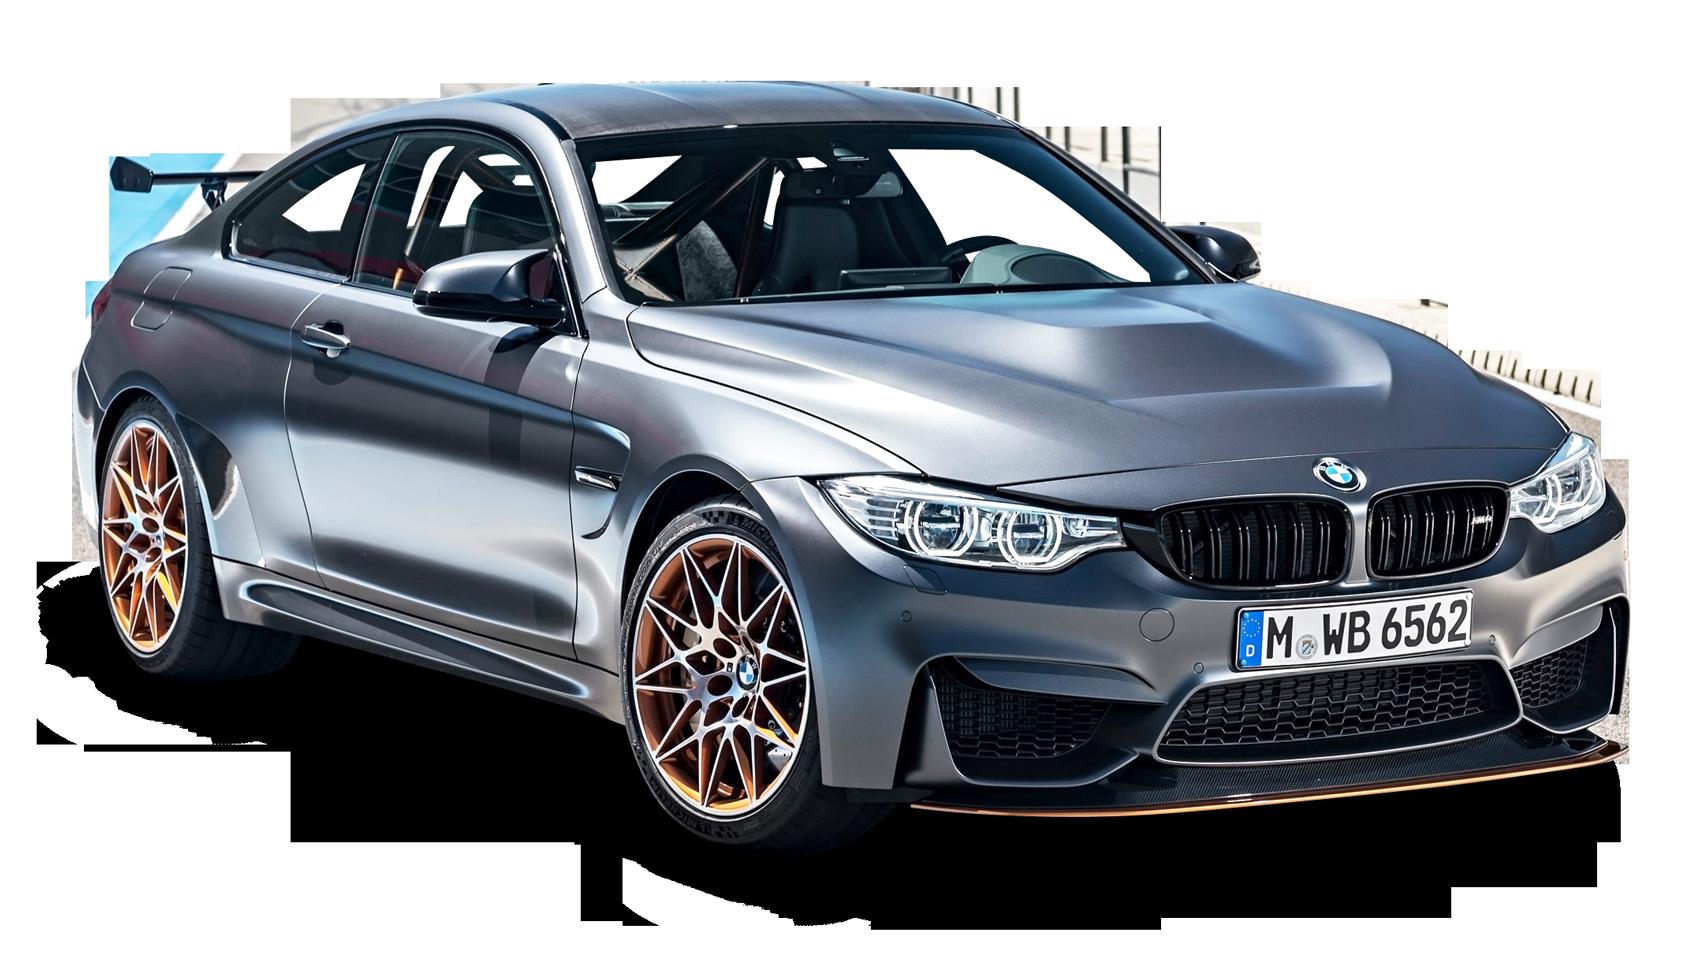 Gray BMW M4 GTS Car PNG Image.